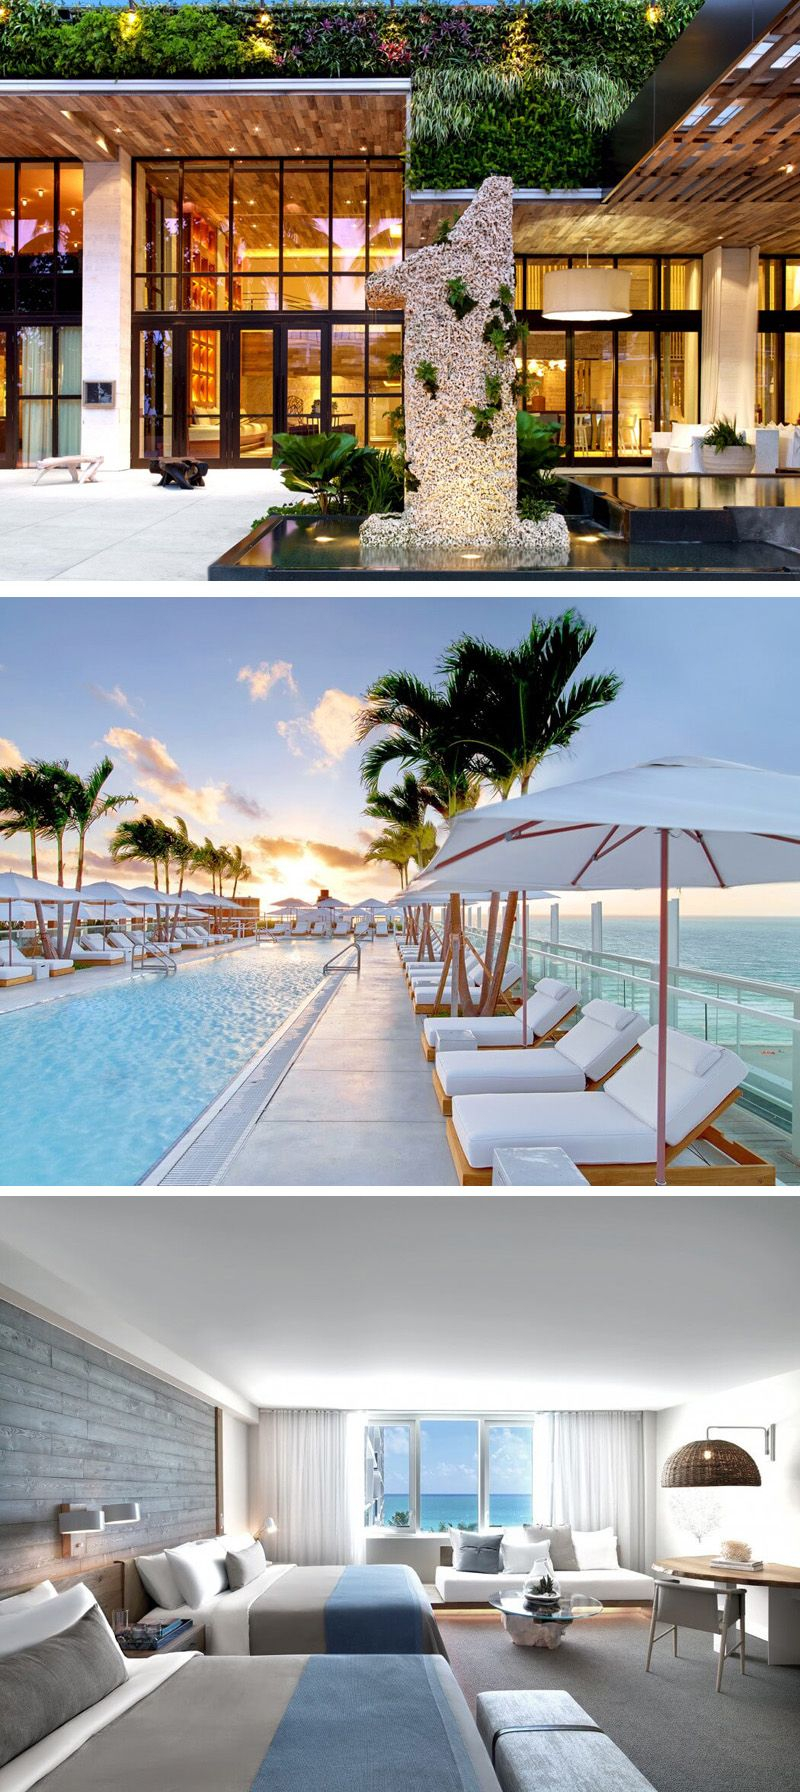 Best Kitchen Gallery: 1 Hotel South Beach Opens In Miami Resorts Pinterest Miami of South Beach Resort Hotels  on rachelxblog.com